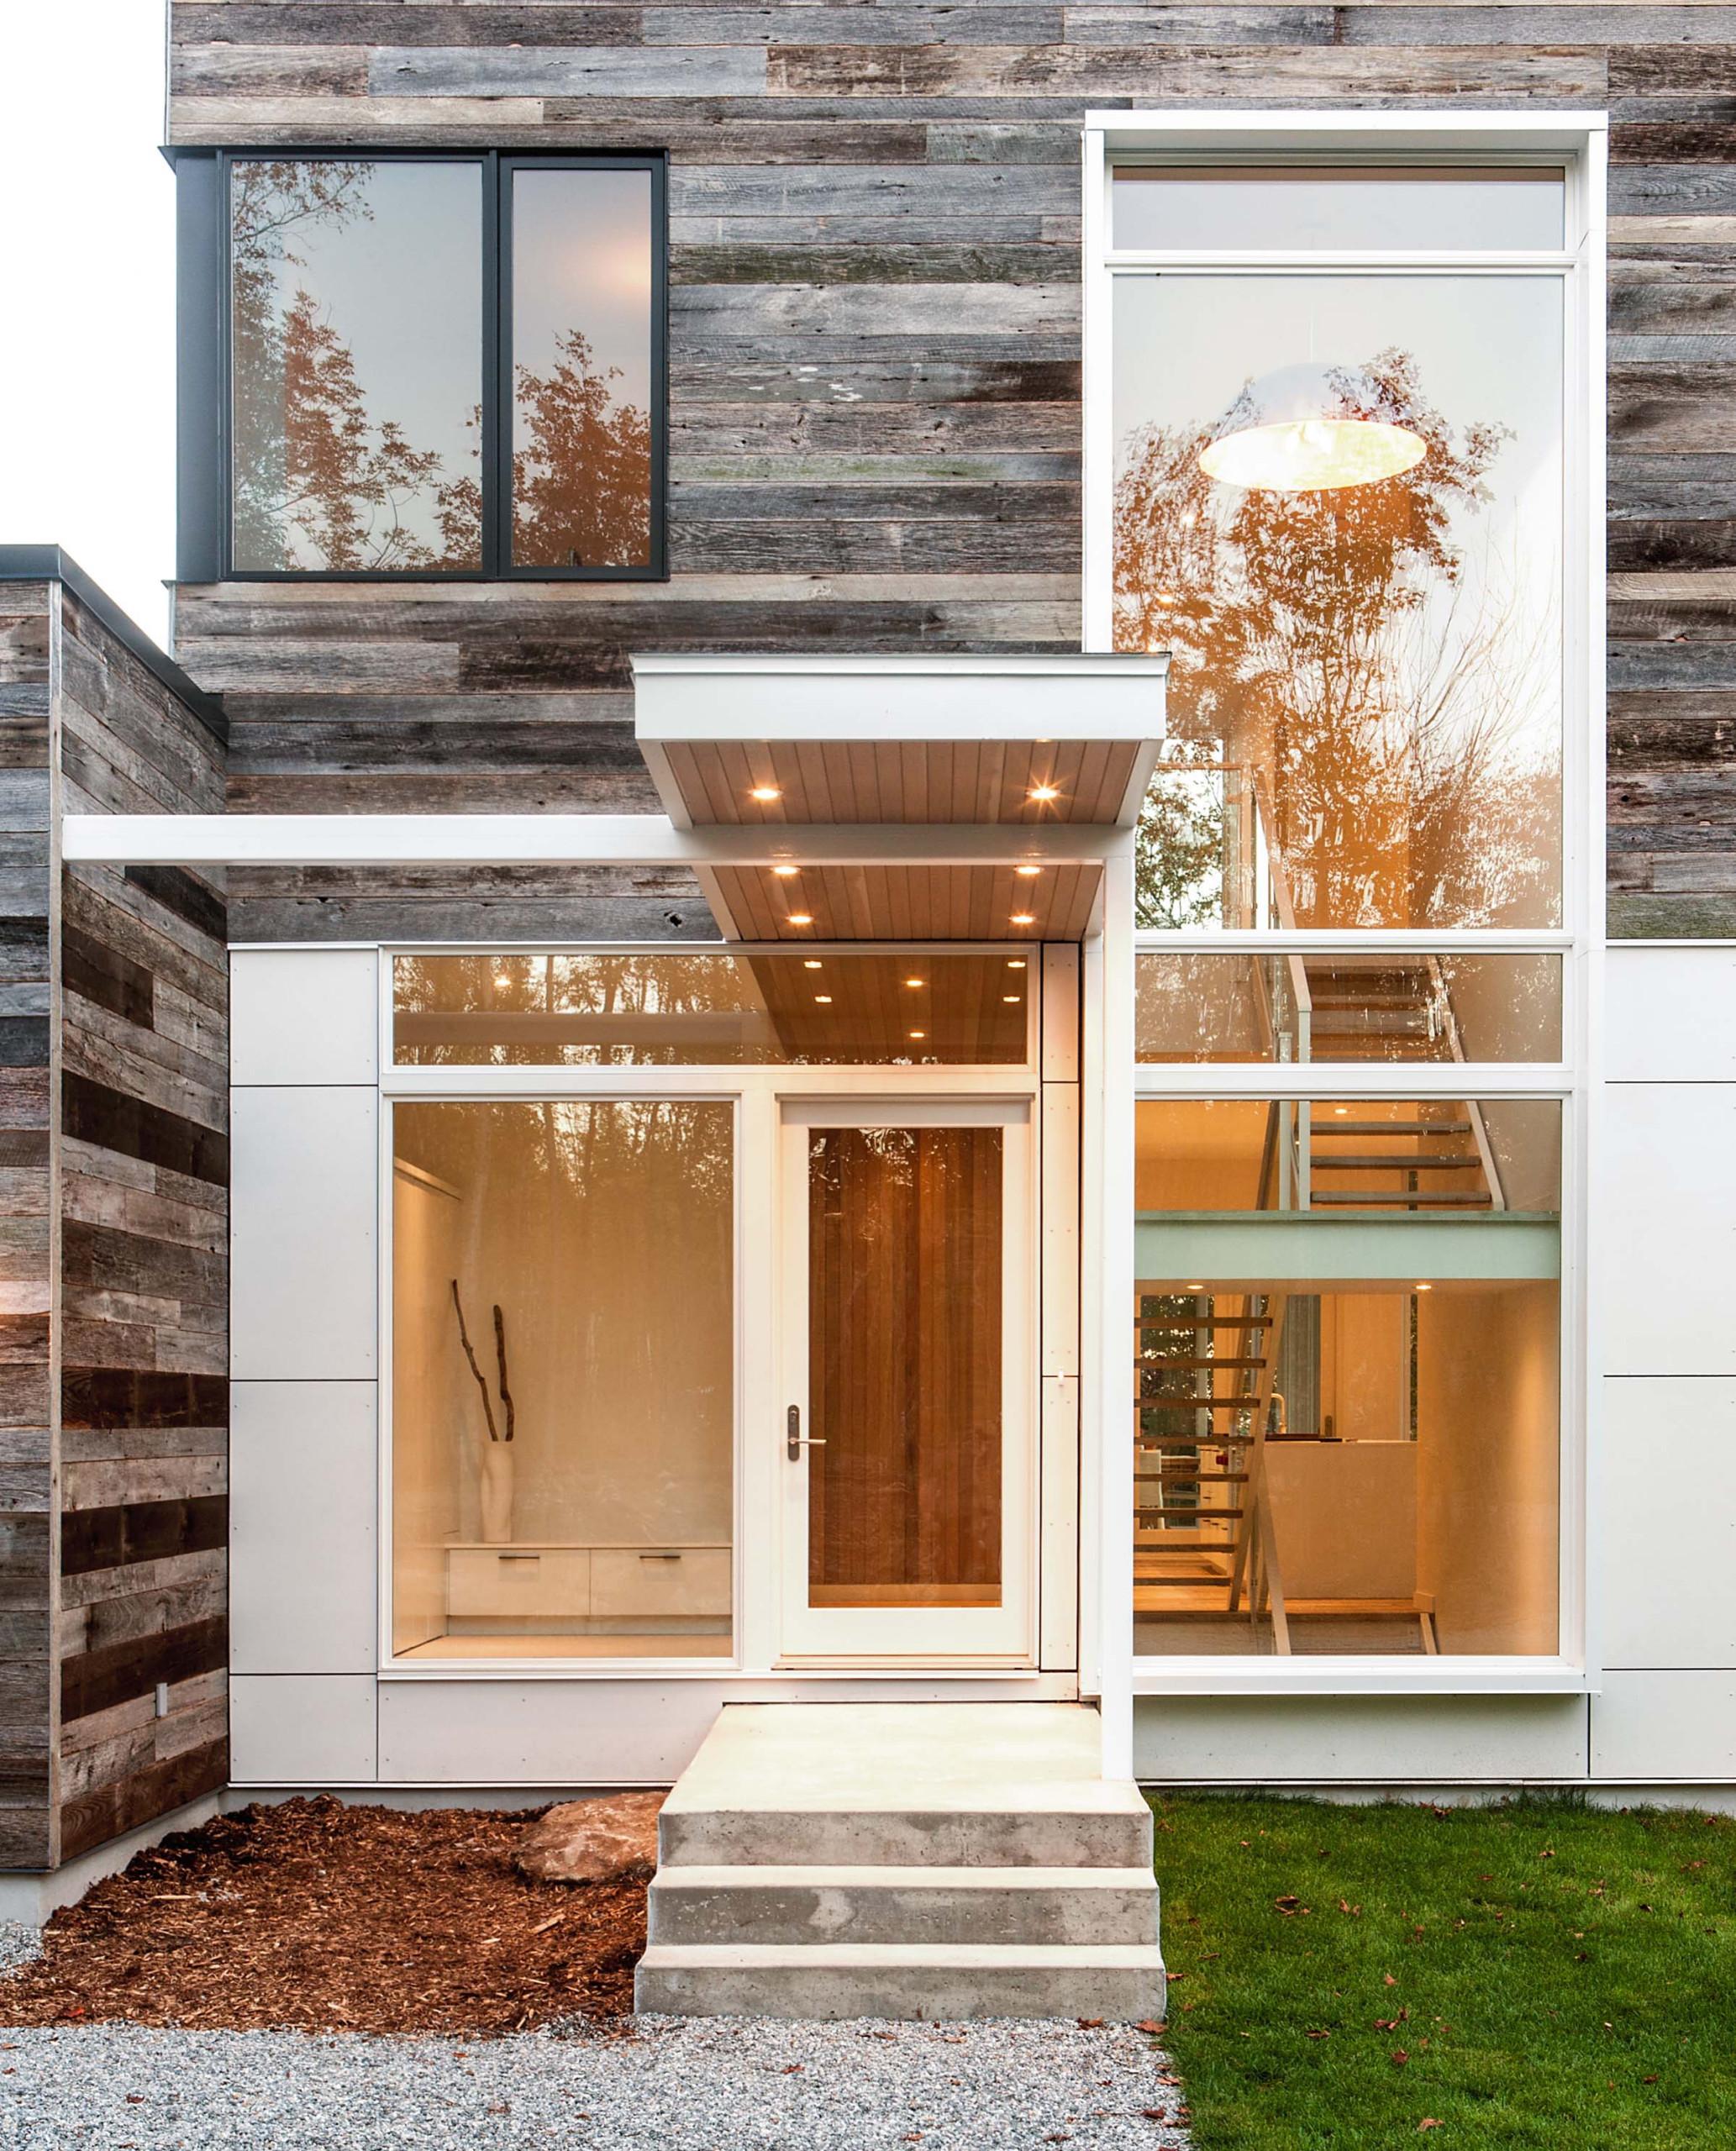 Porch Overhang Houzz